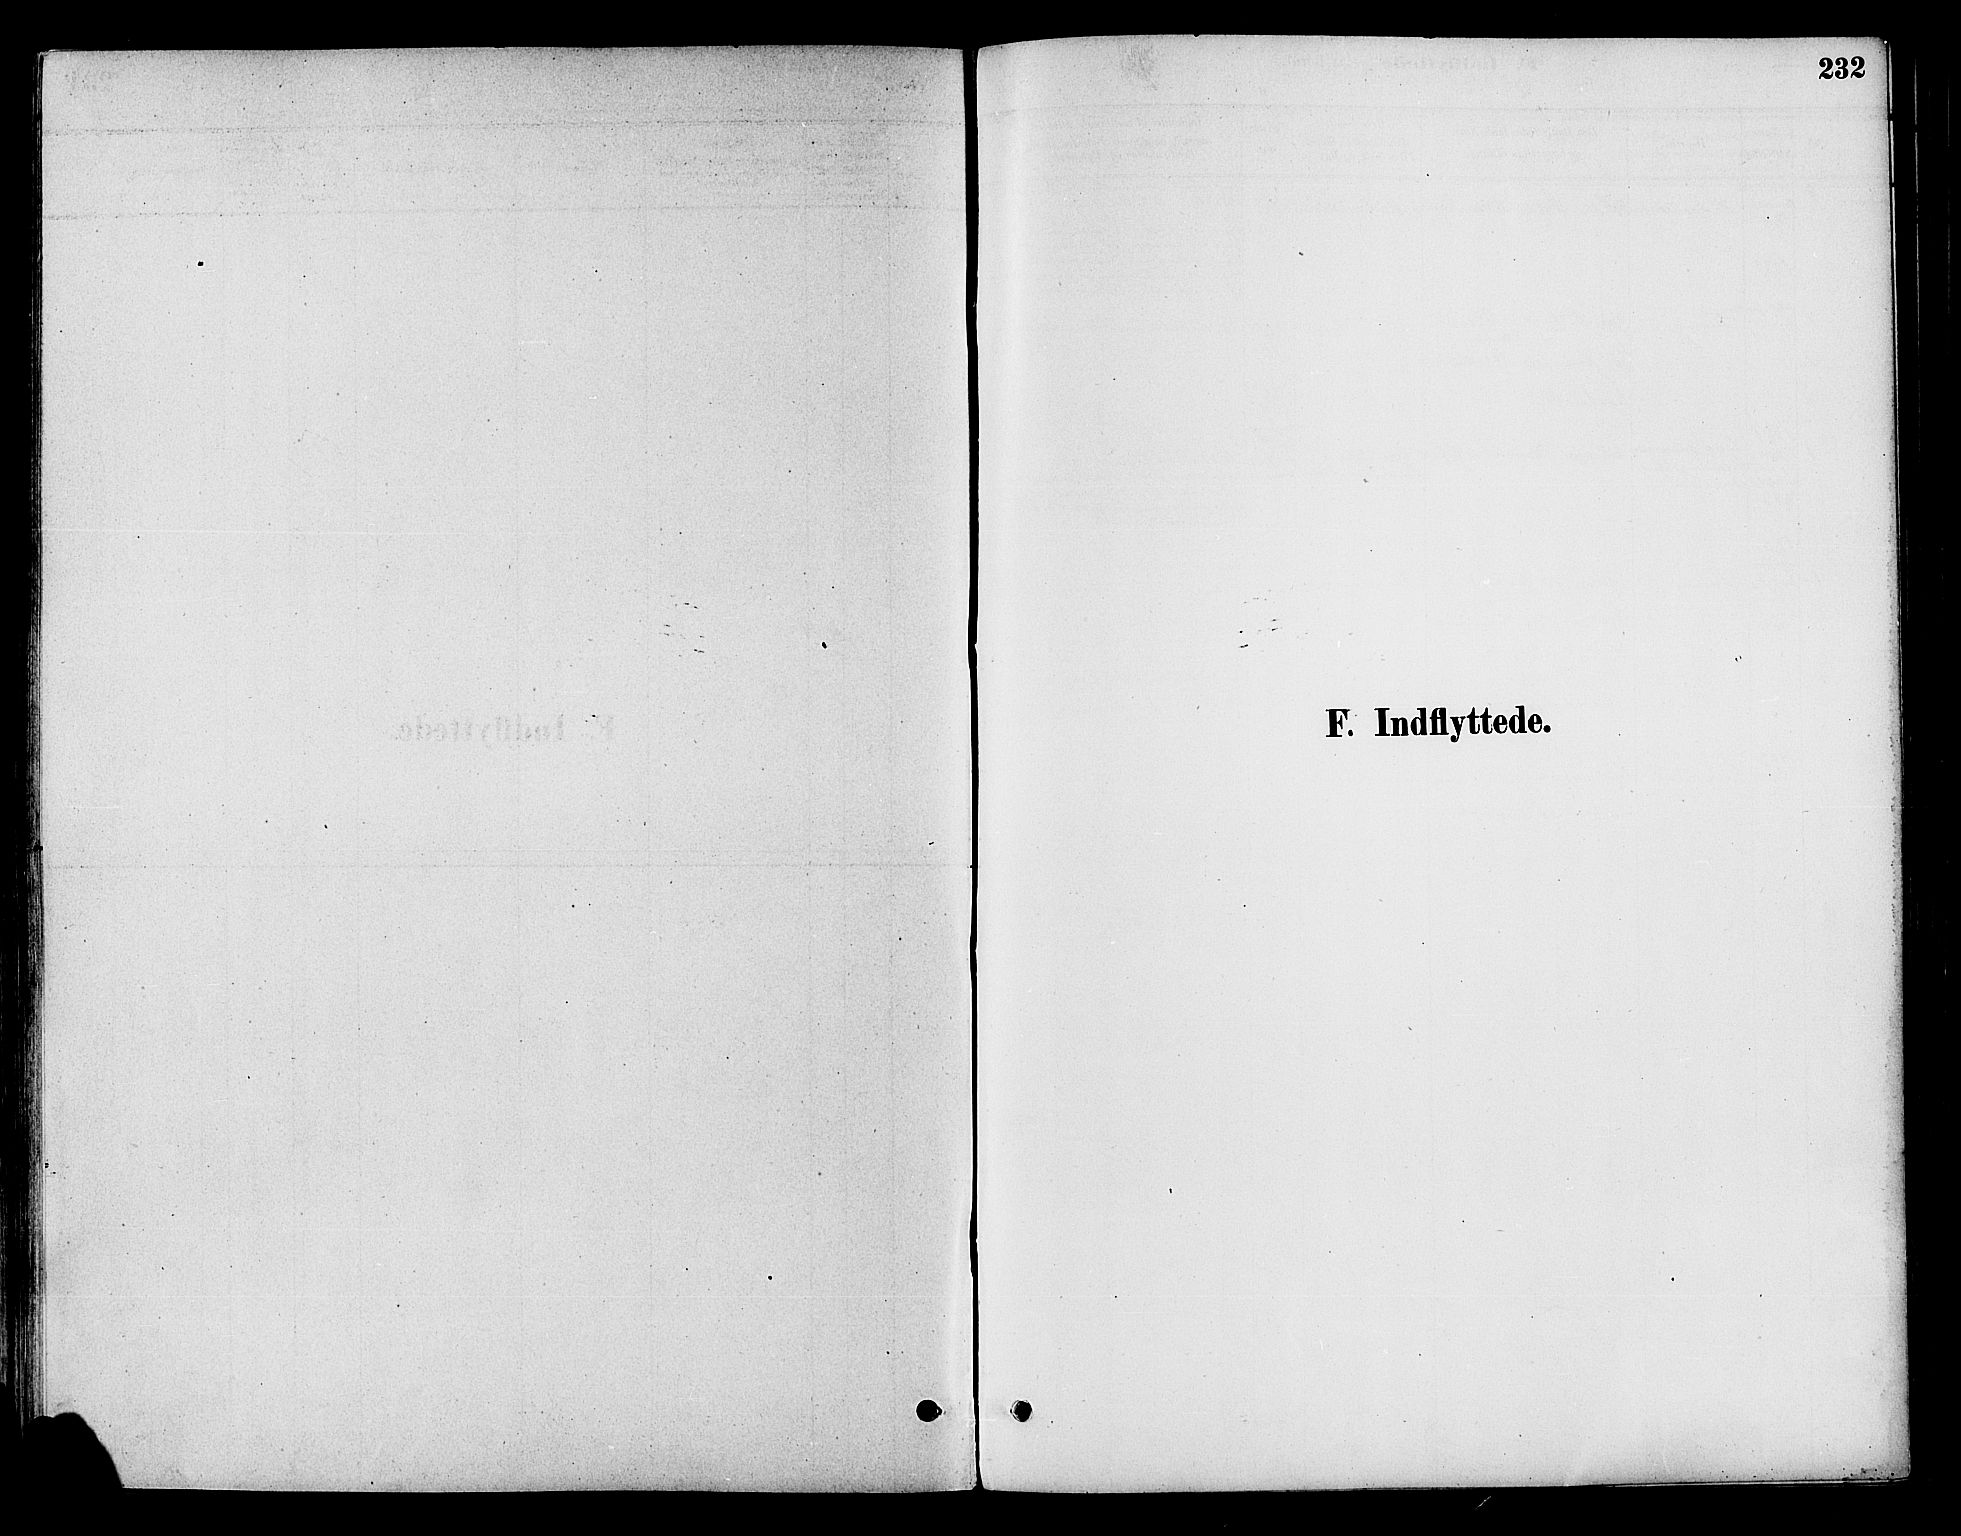 SAH, Østre Toten prestekontor, Ministerialbok nr. 7, 1881-1896, s. 232